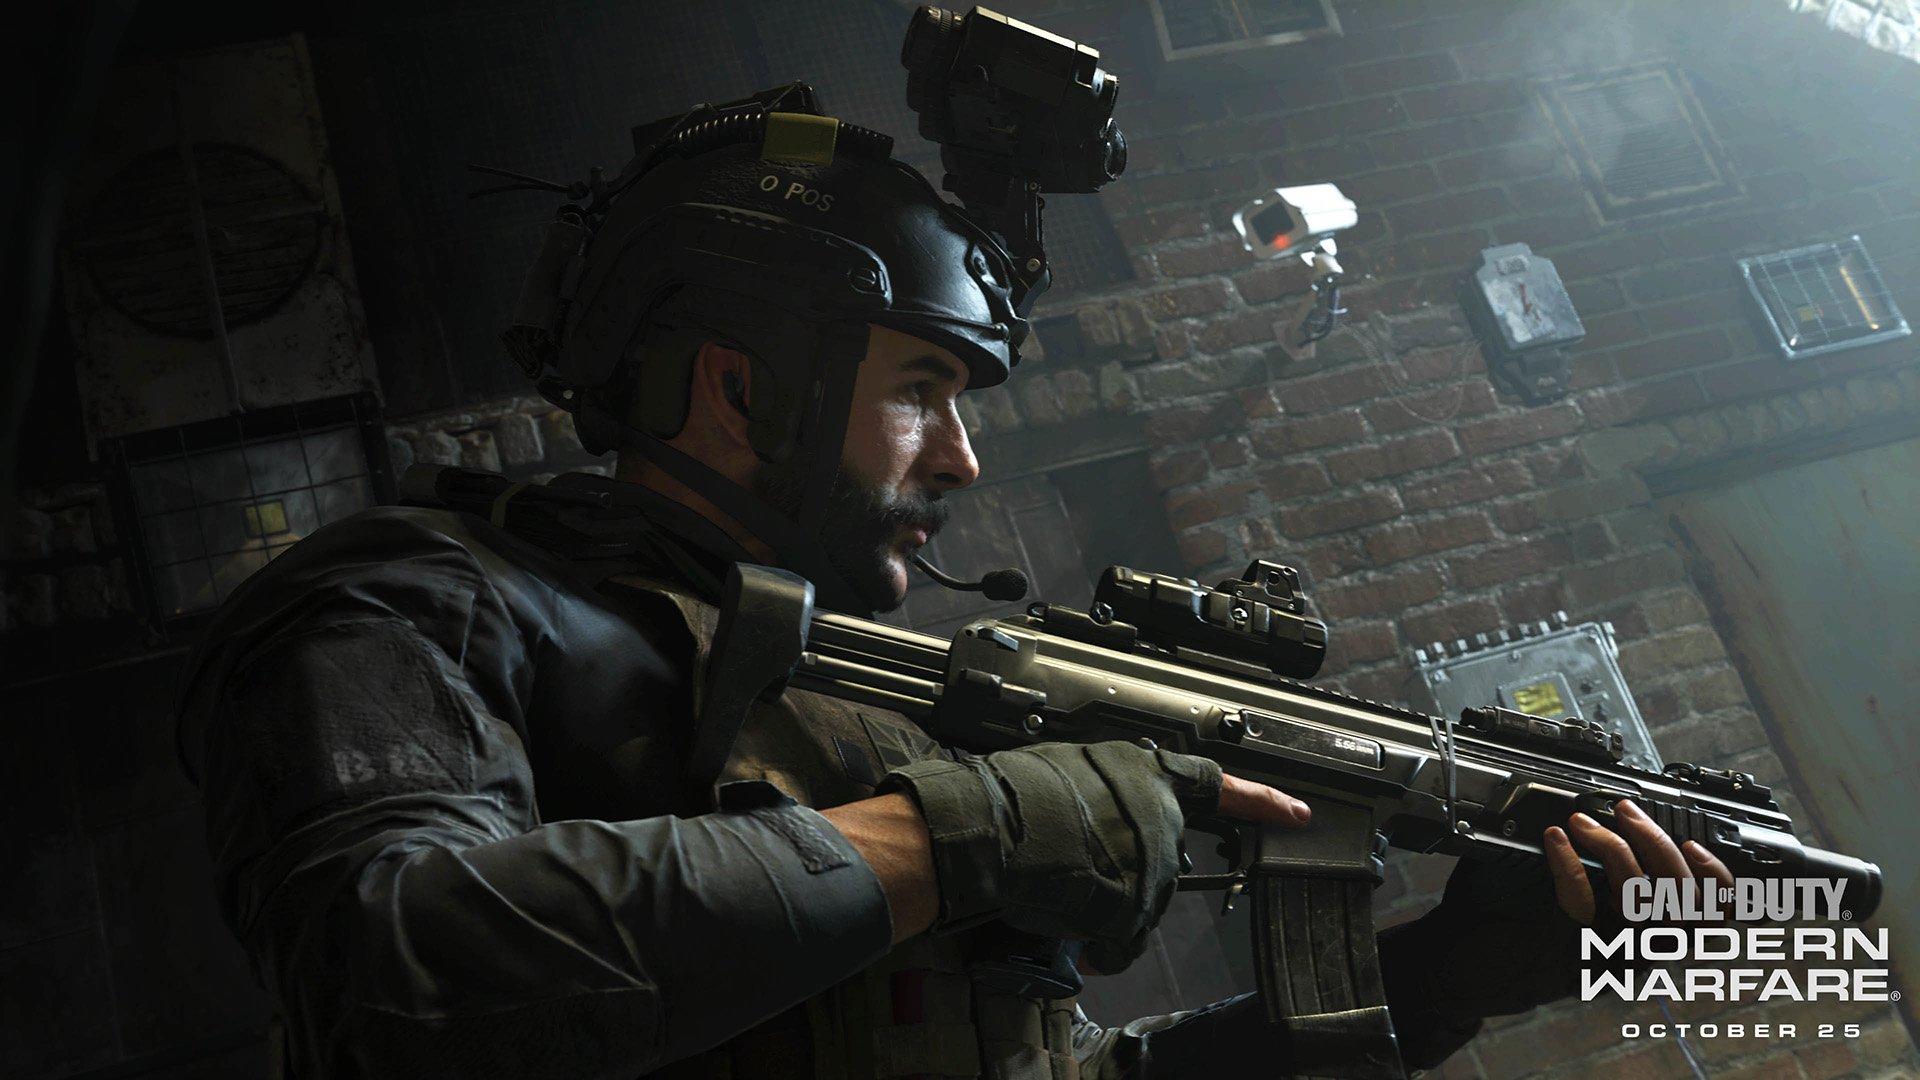 Where was the new Call of Duty: Modern Warfare trailer at E3 2019?